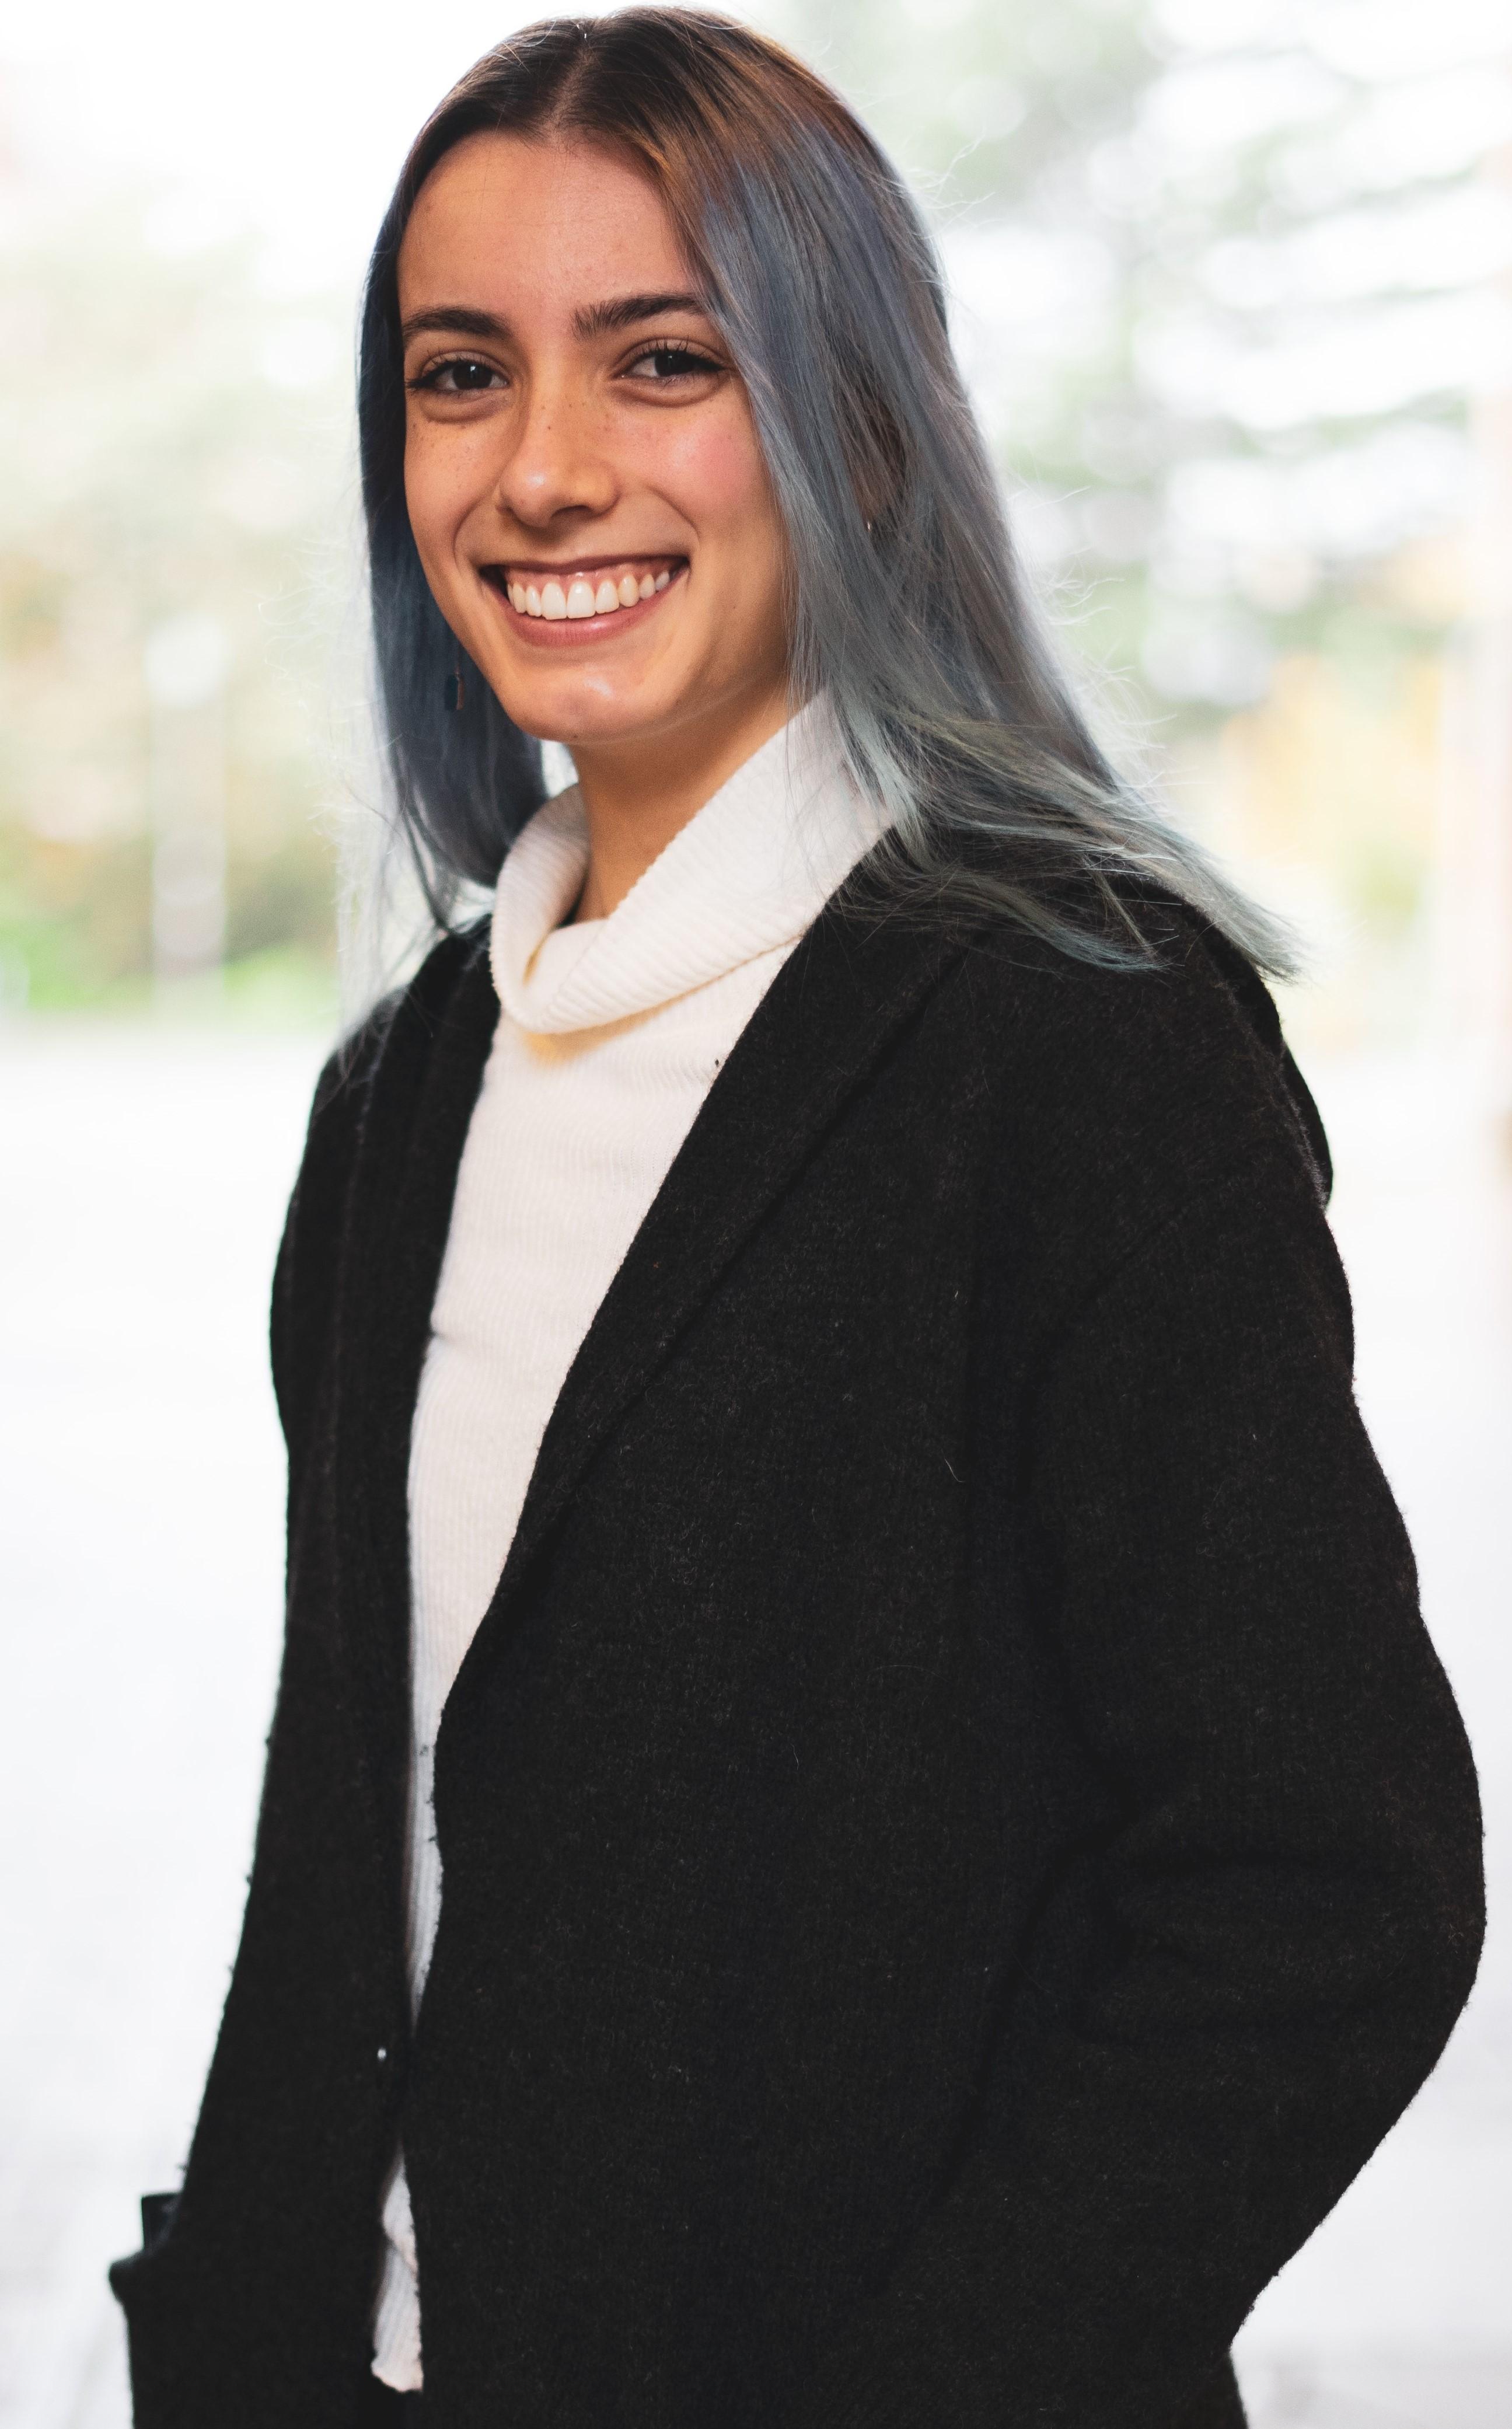 Beatriz Cuevas, Molecular, Cellular & Developmental Biology / Psychology